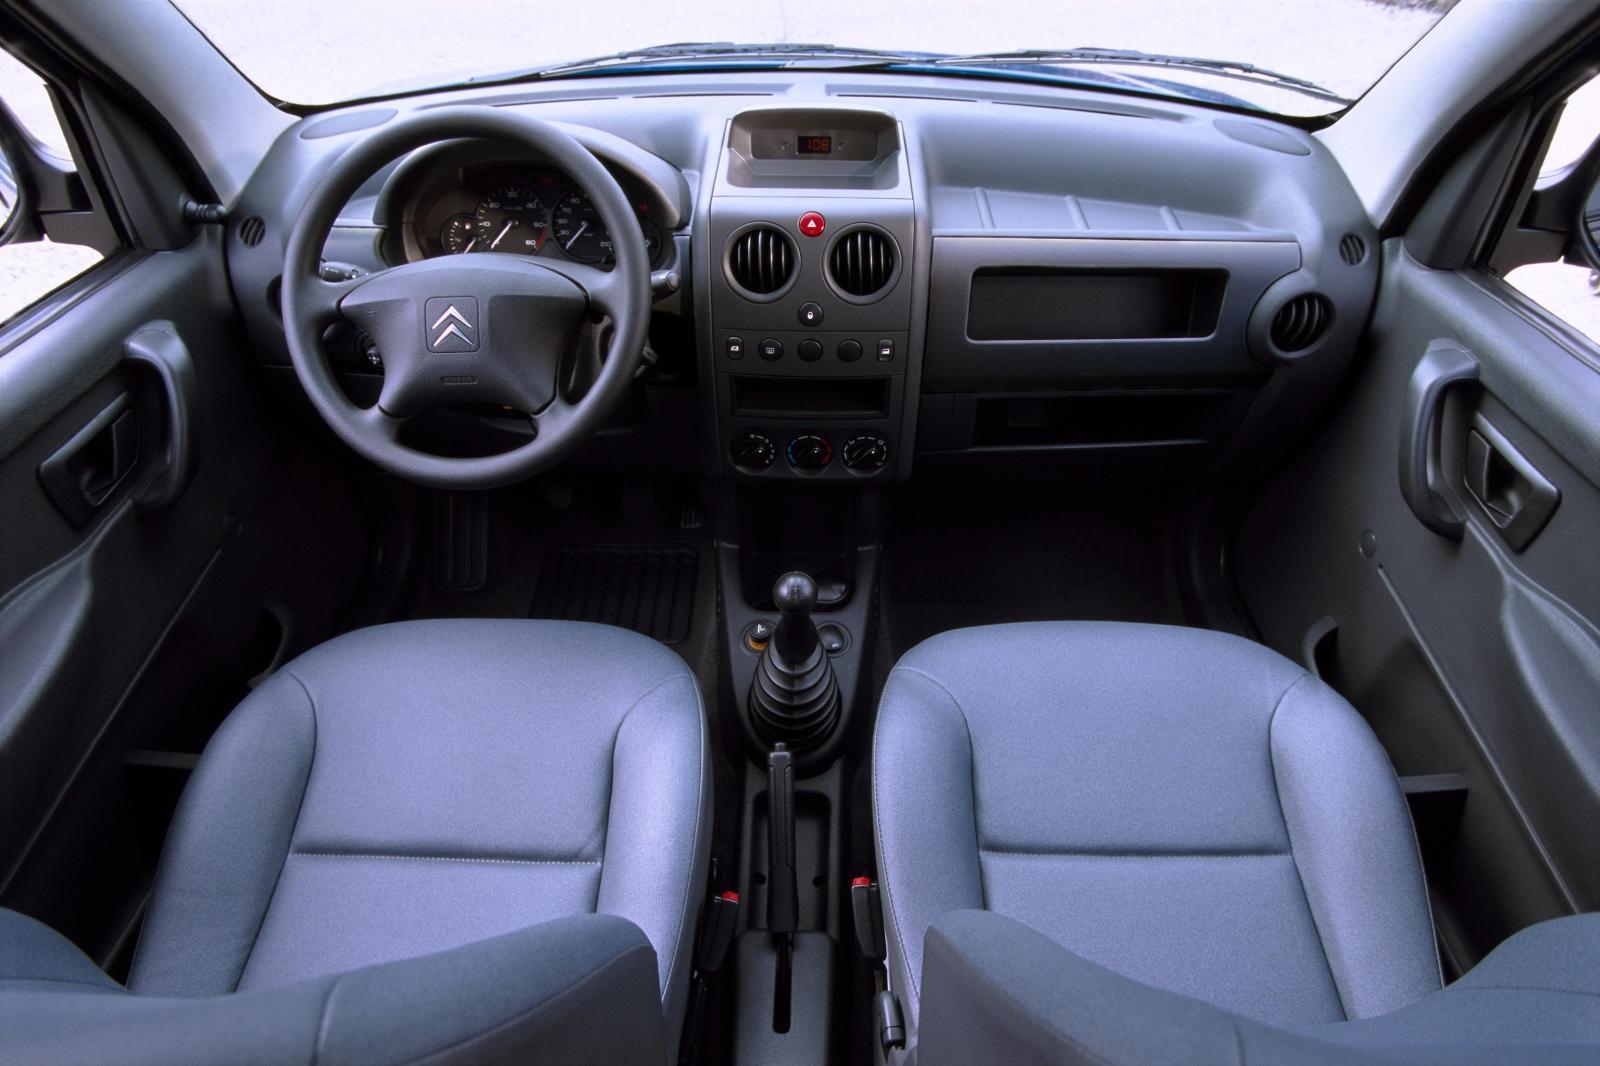 Berlingo 2002 intérieur